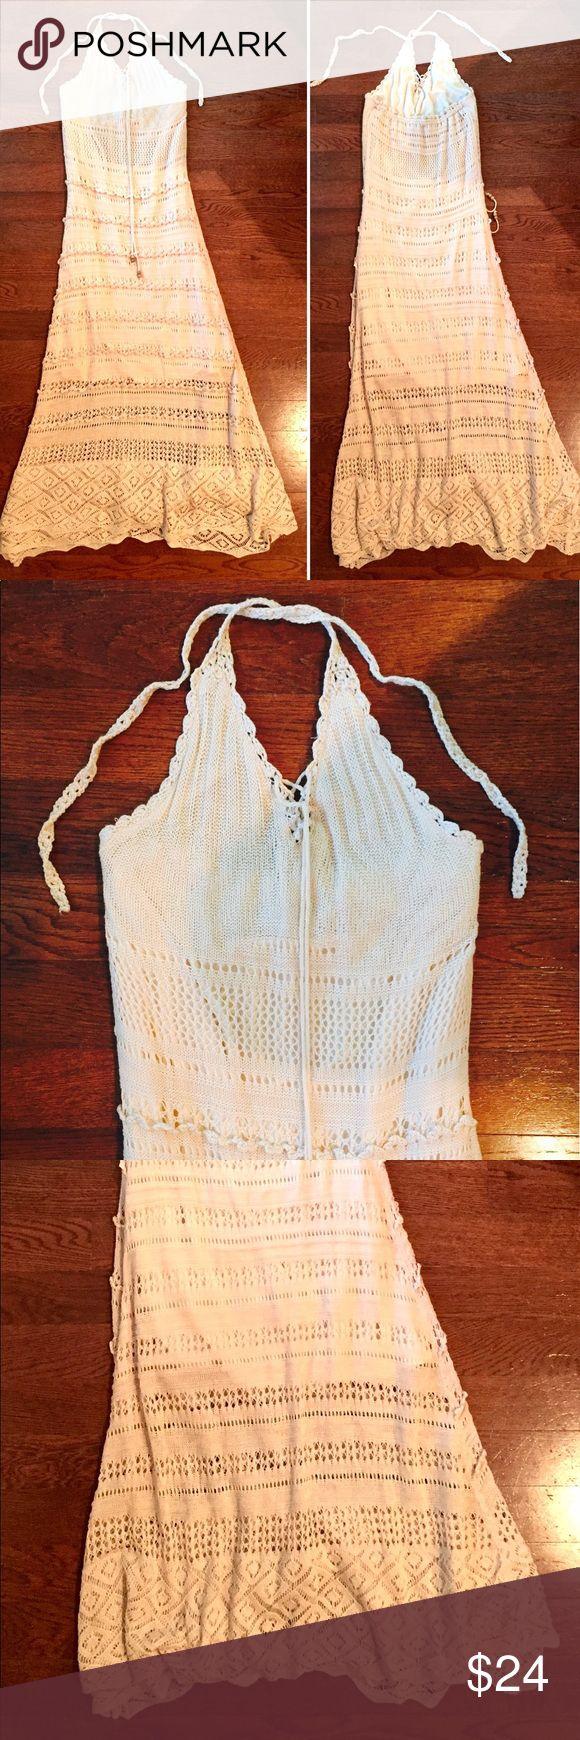 Solitaire Swim Cover Up Dress White Crochet Maxi Solitaire Swim Cover Up Dress White Crochet Lace Maxi Halter Sleeveless Size Medium M Preowned good condition solitare swim Dresses Maxi